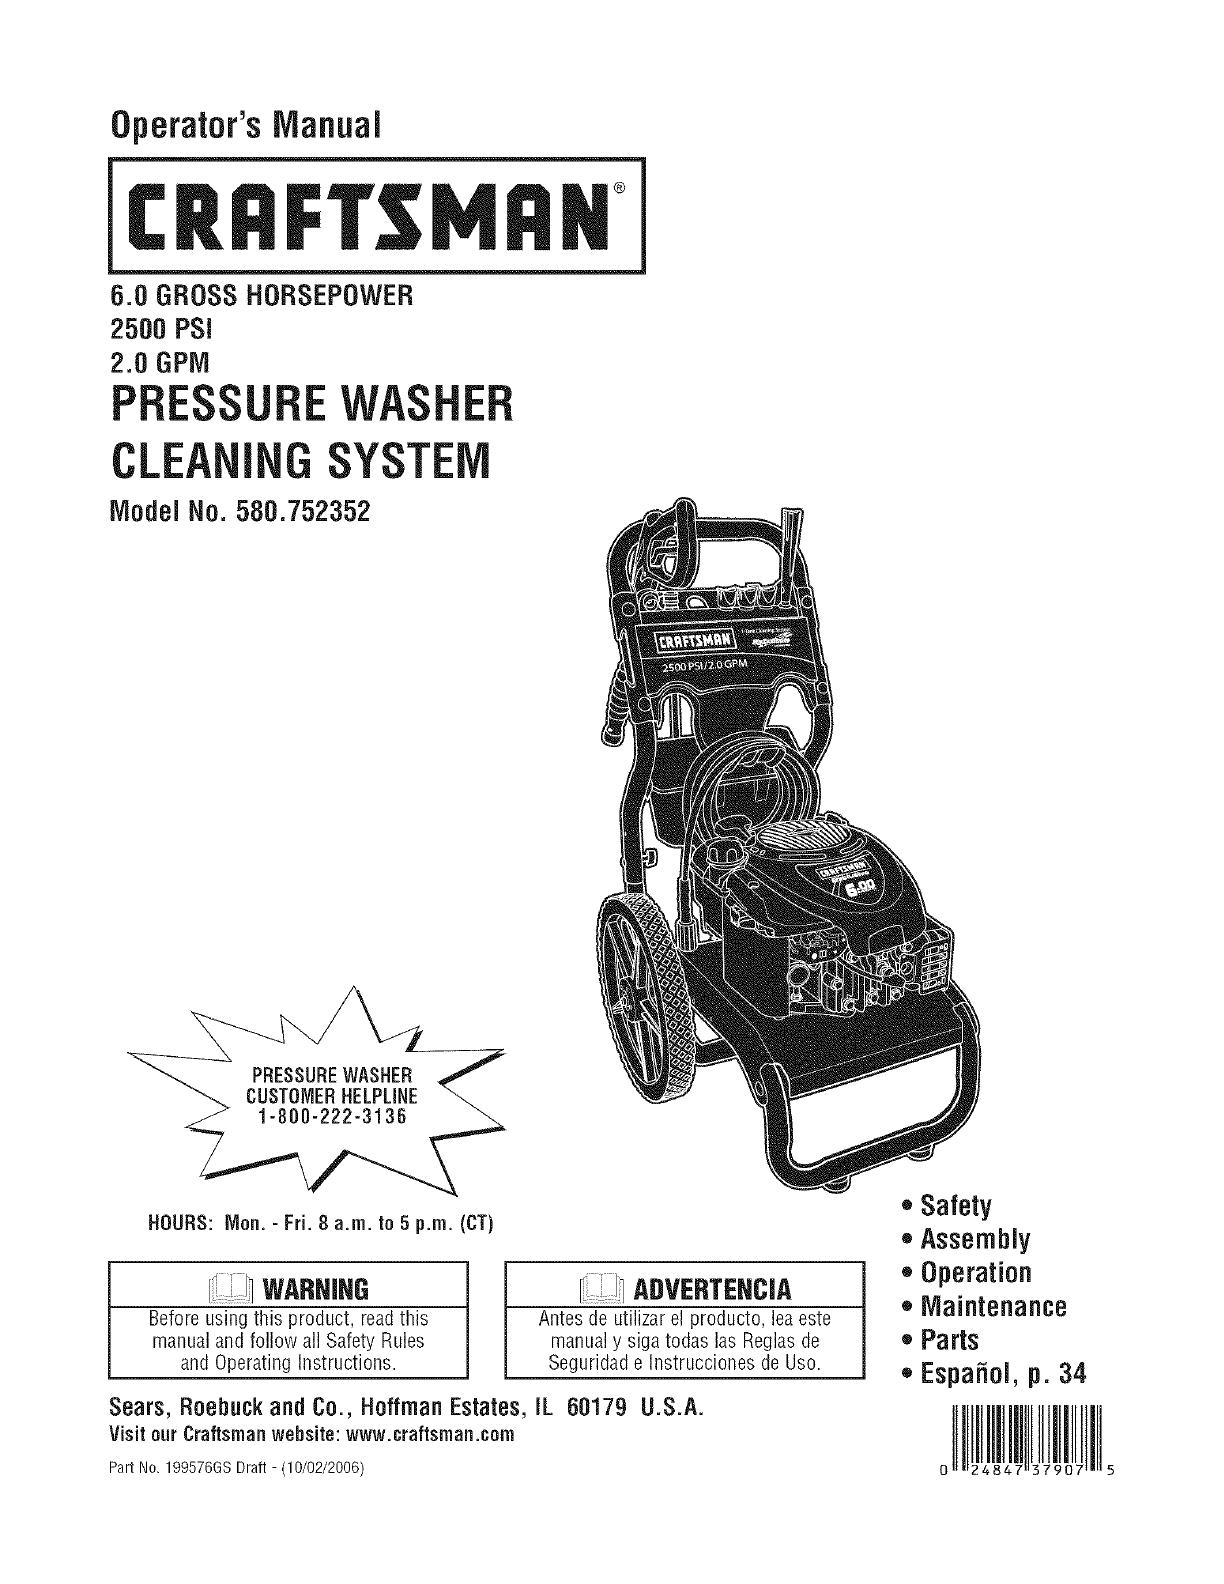 Craftsman 580752352 User Manual PRESSURE WASHER Manuals